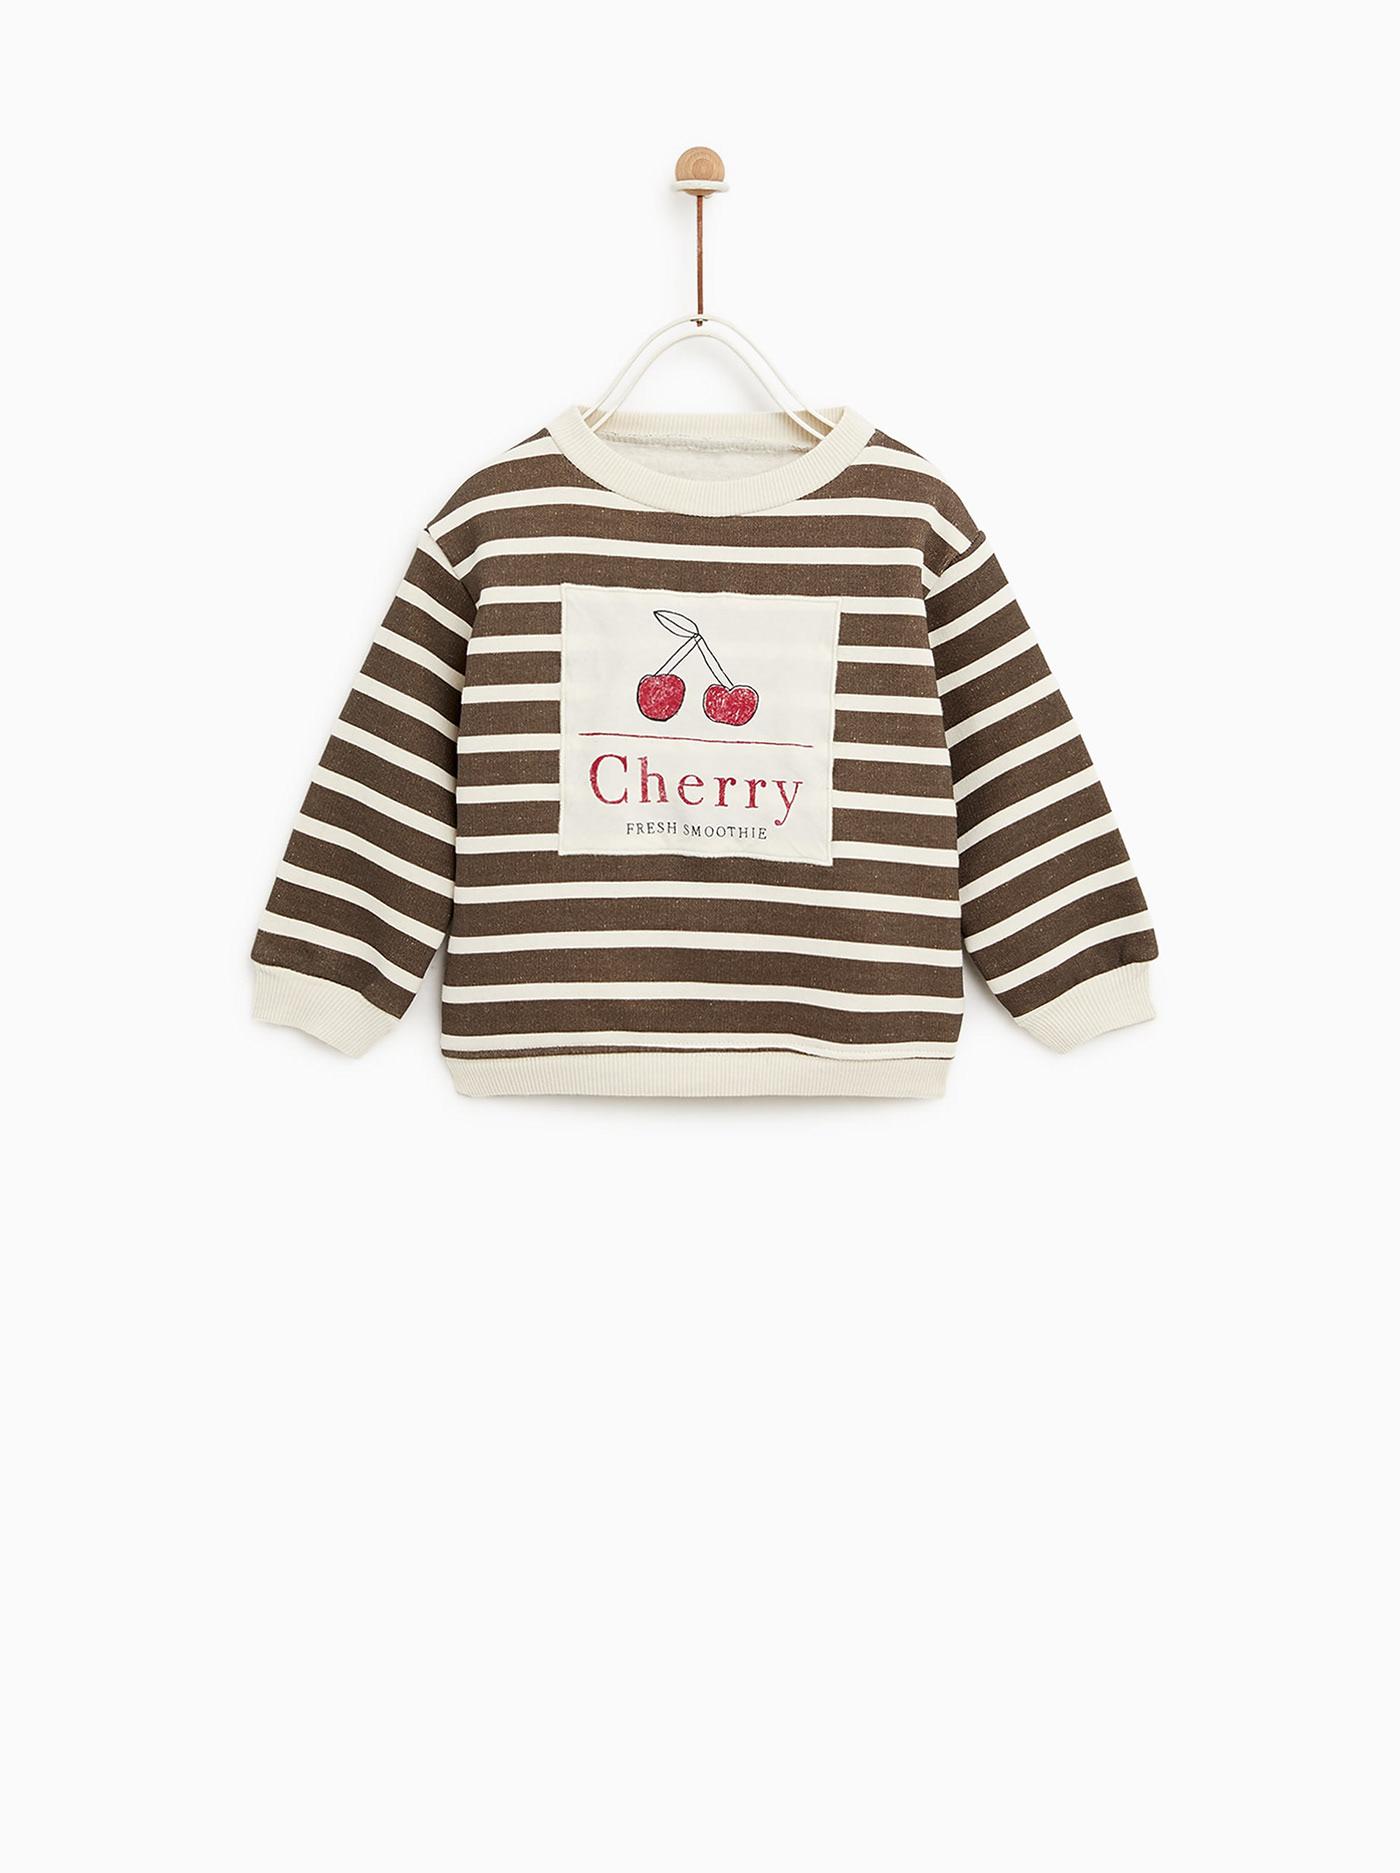 Cherry sweatshirt for Zara Baby Girl AW18 on Behance